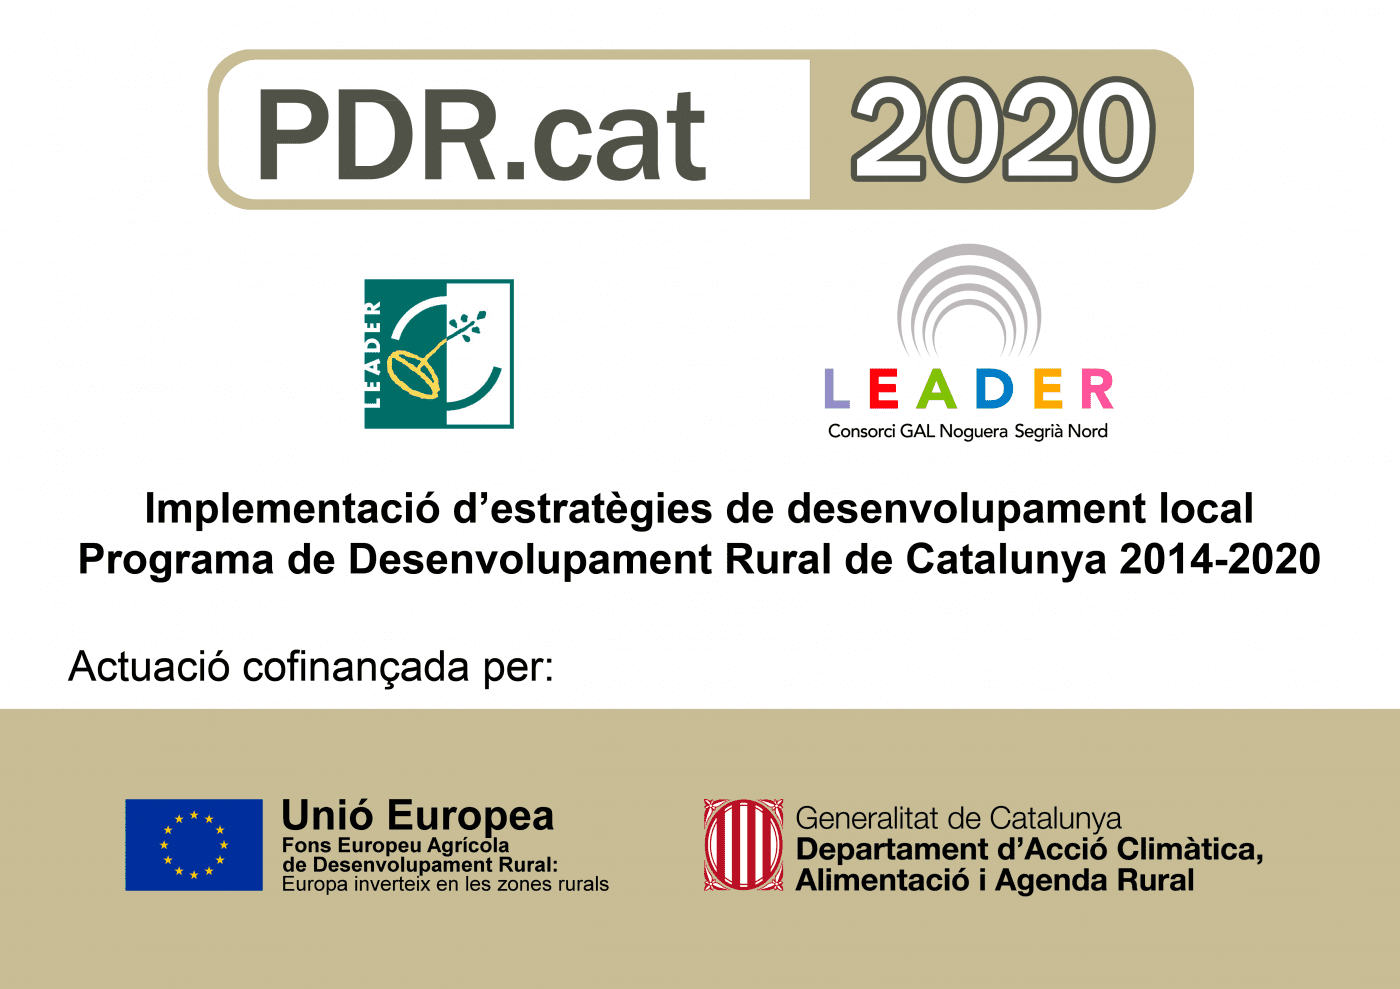 Programa Leader PDR.cat